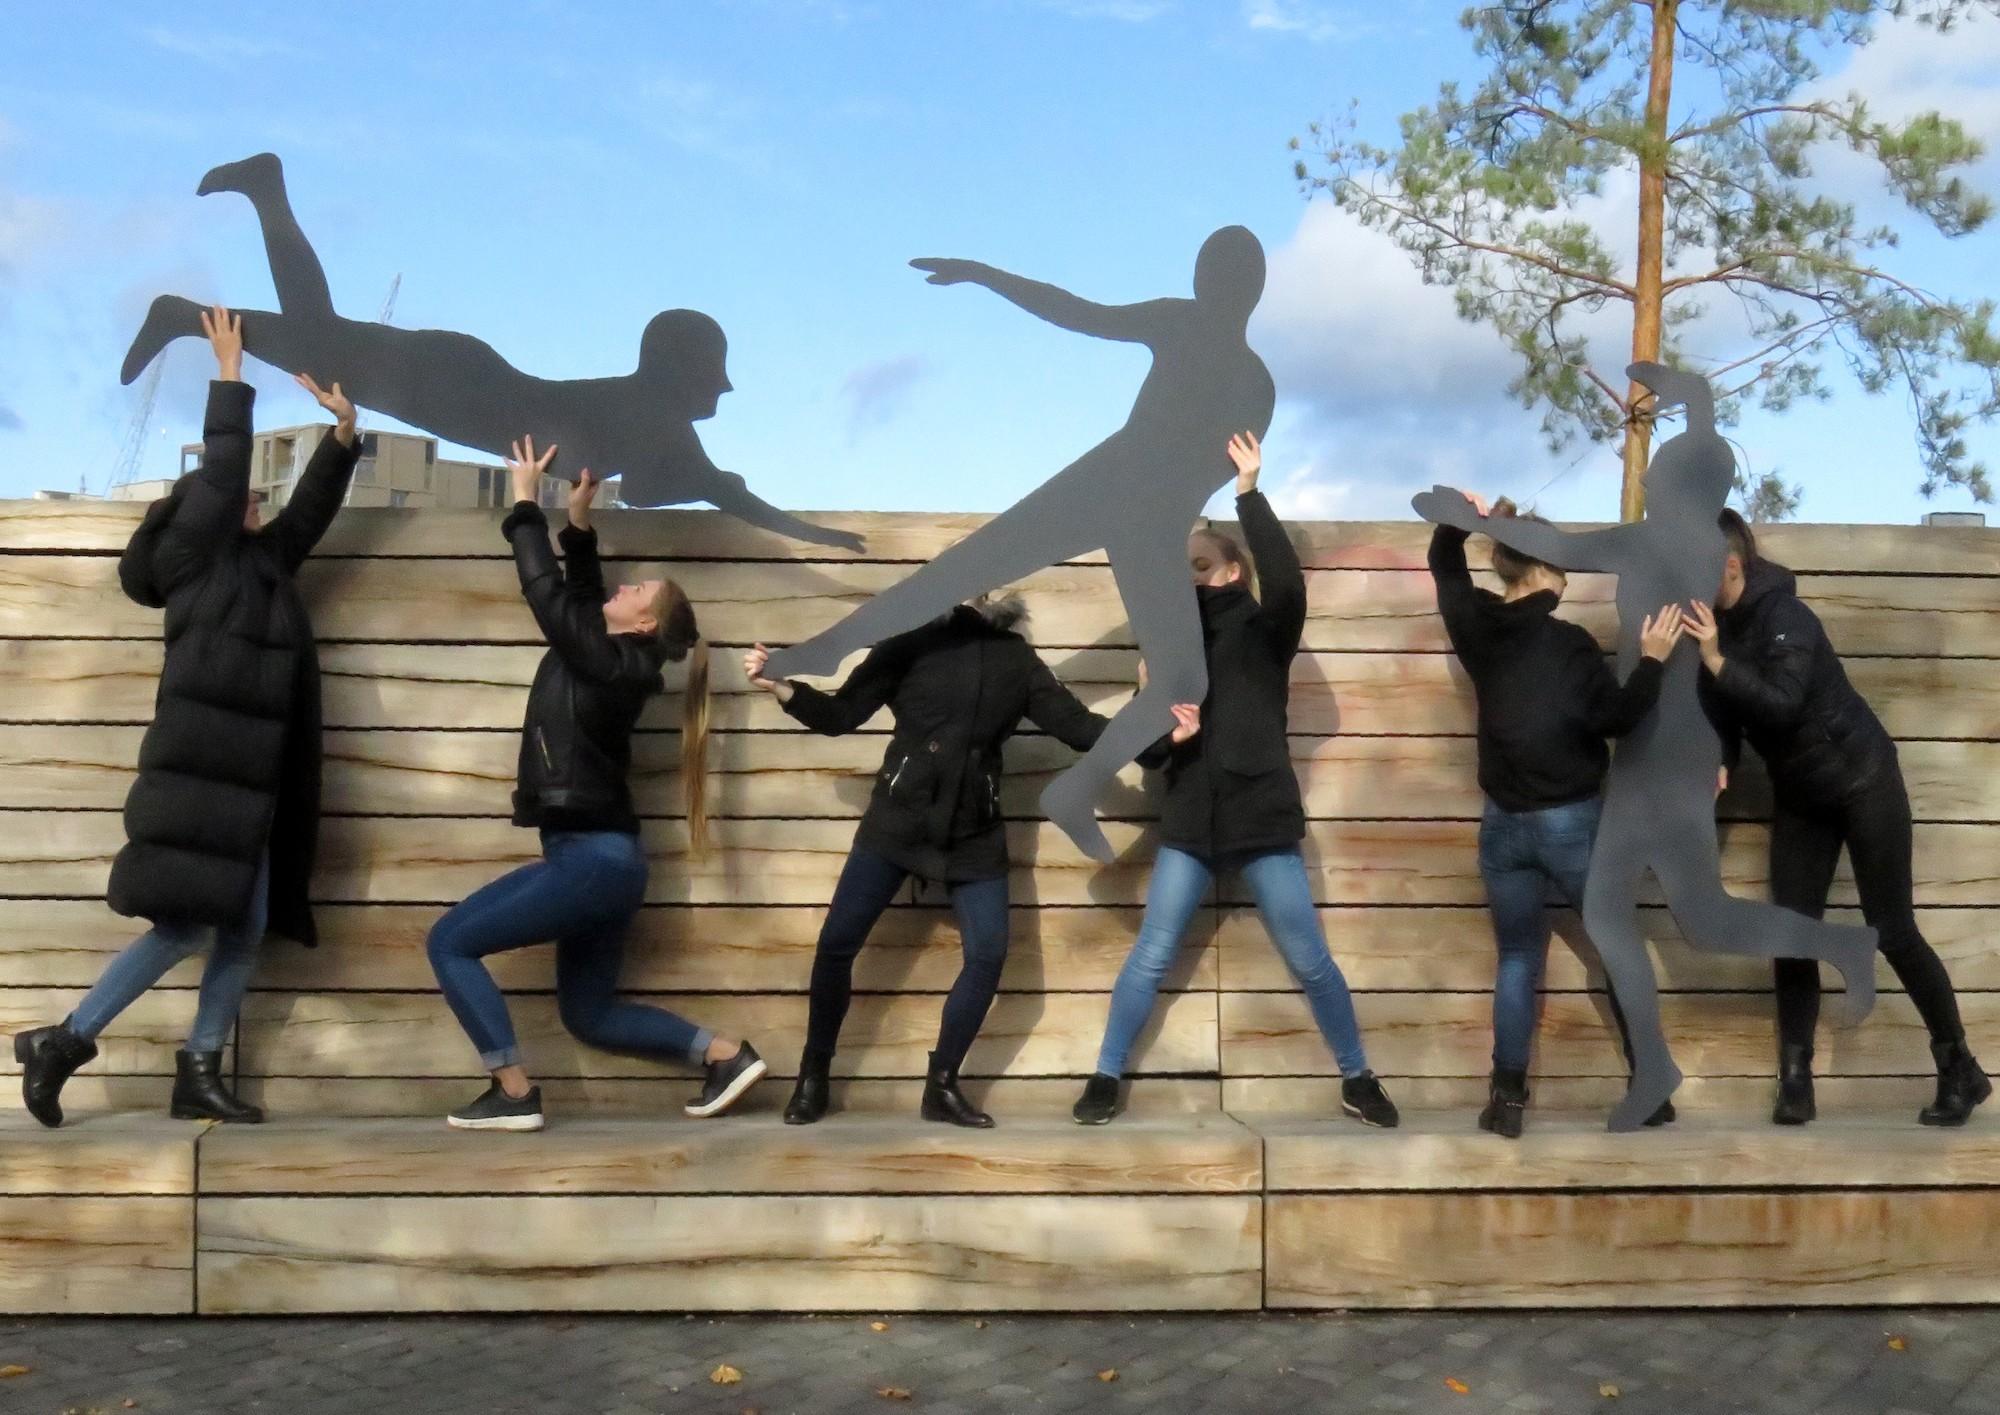 lolaroggeschule-lola-rogge-platz-2018-buggischlolaroggeschule-llola-rogge-platz-2018-buggischIMG_1200-1